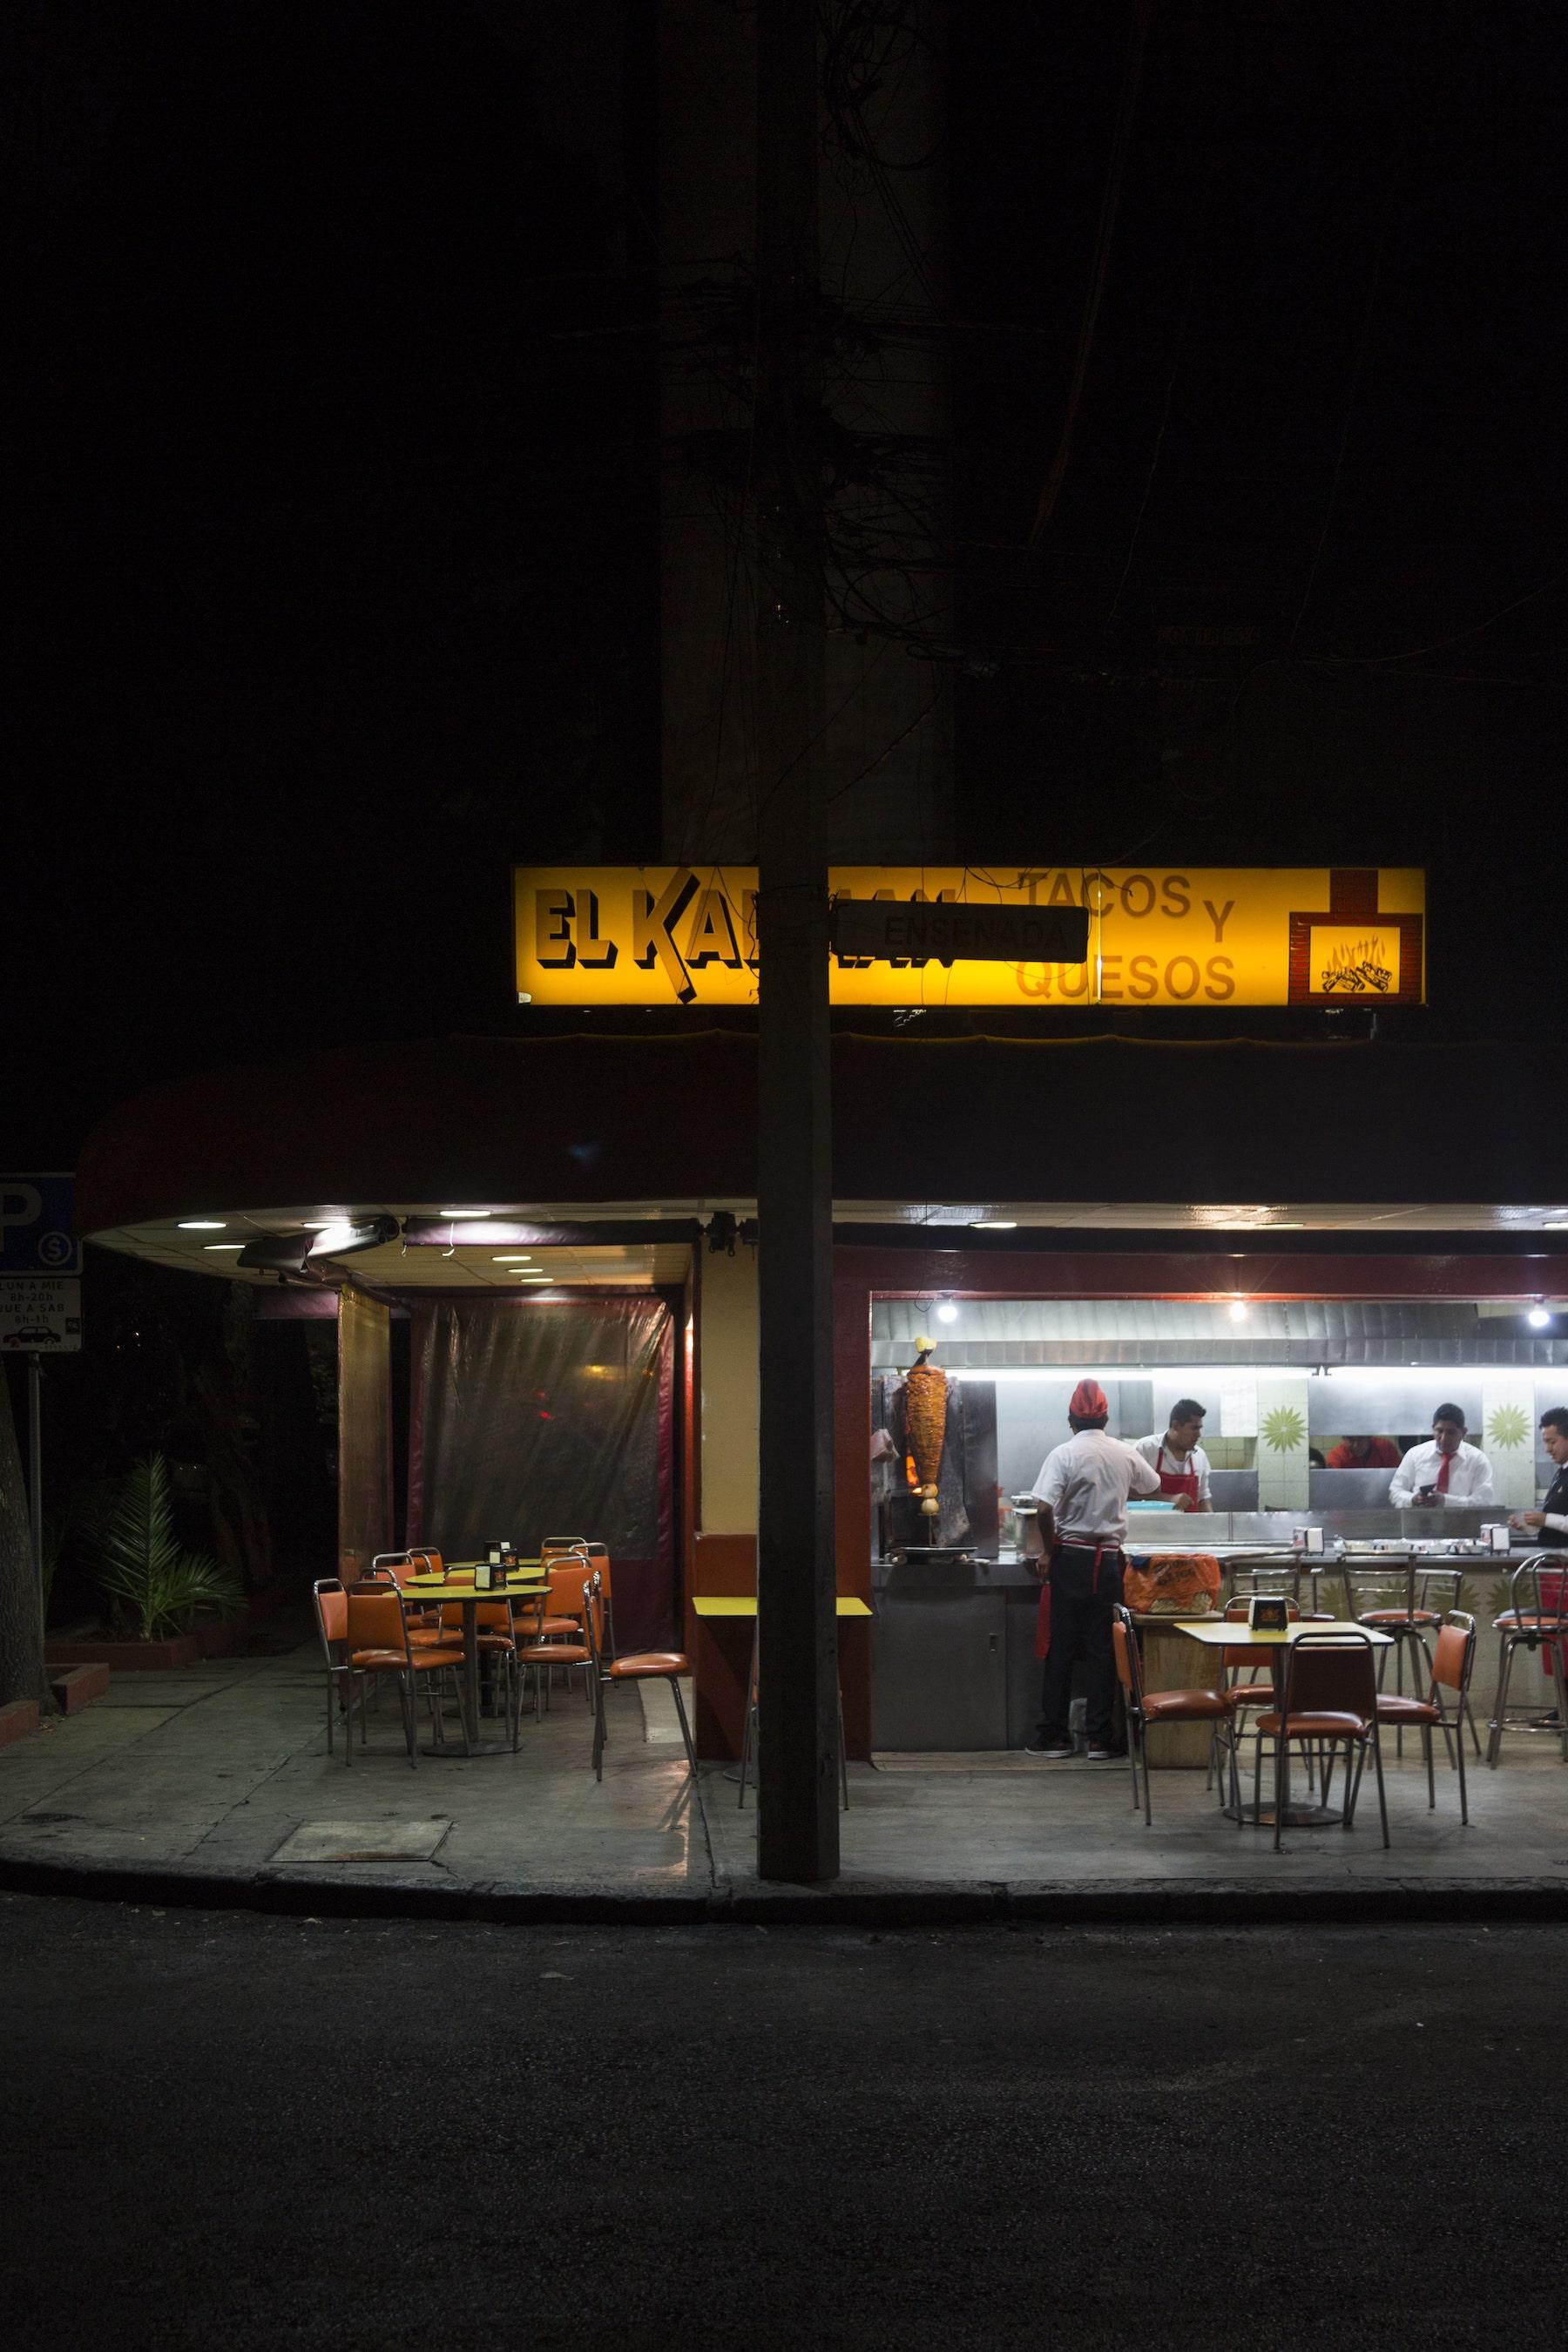 07152019_galeria-taqueros 13 kaliman noche.jpg